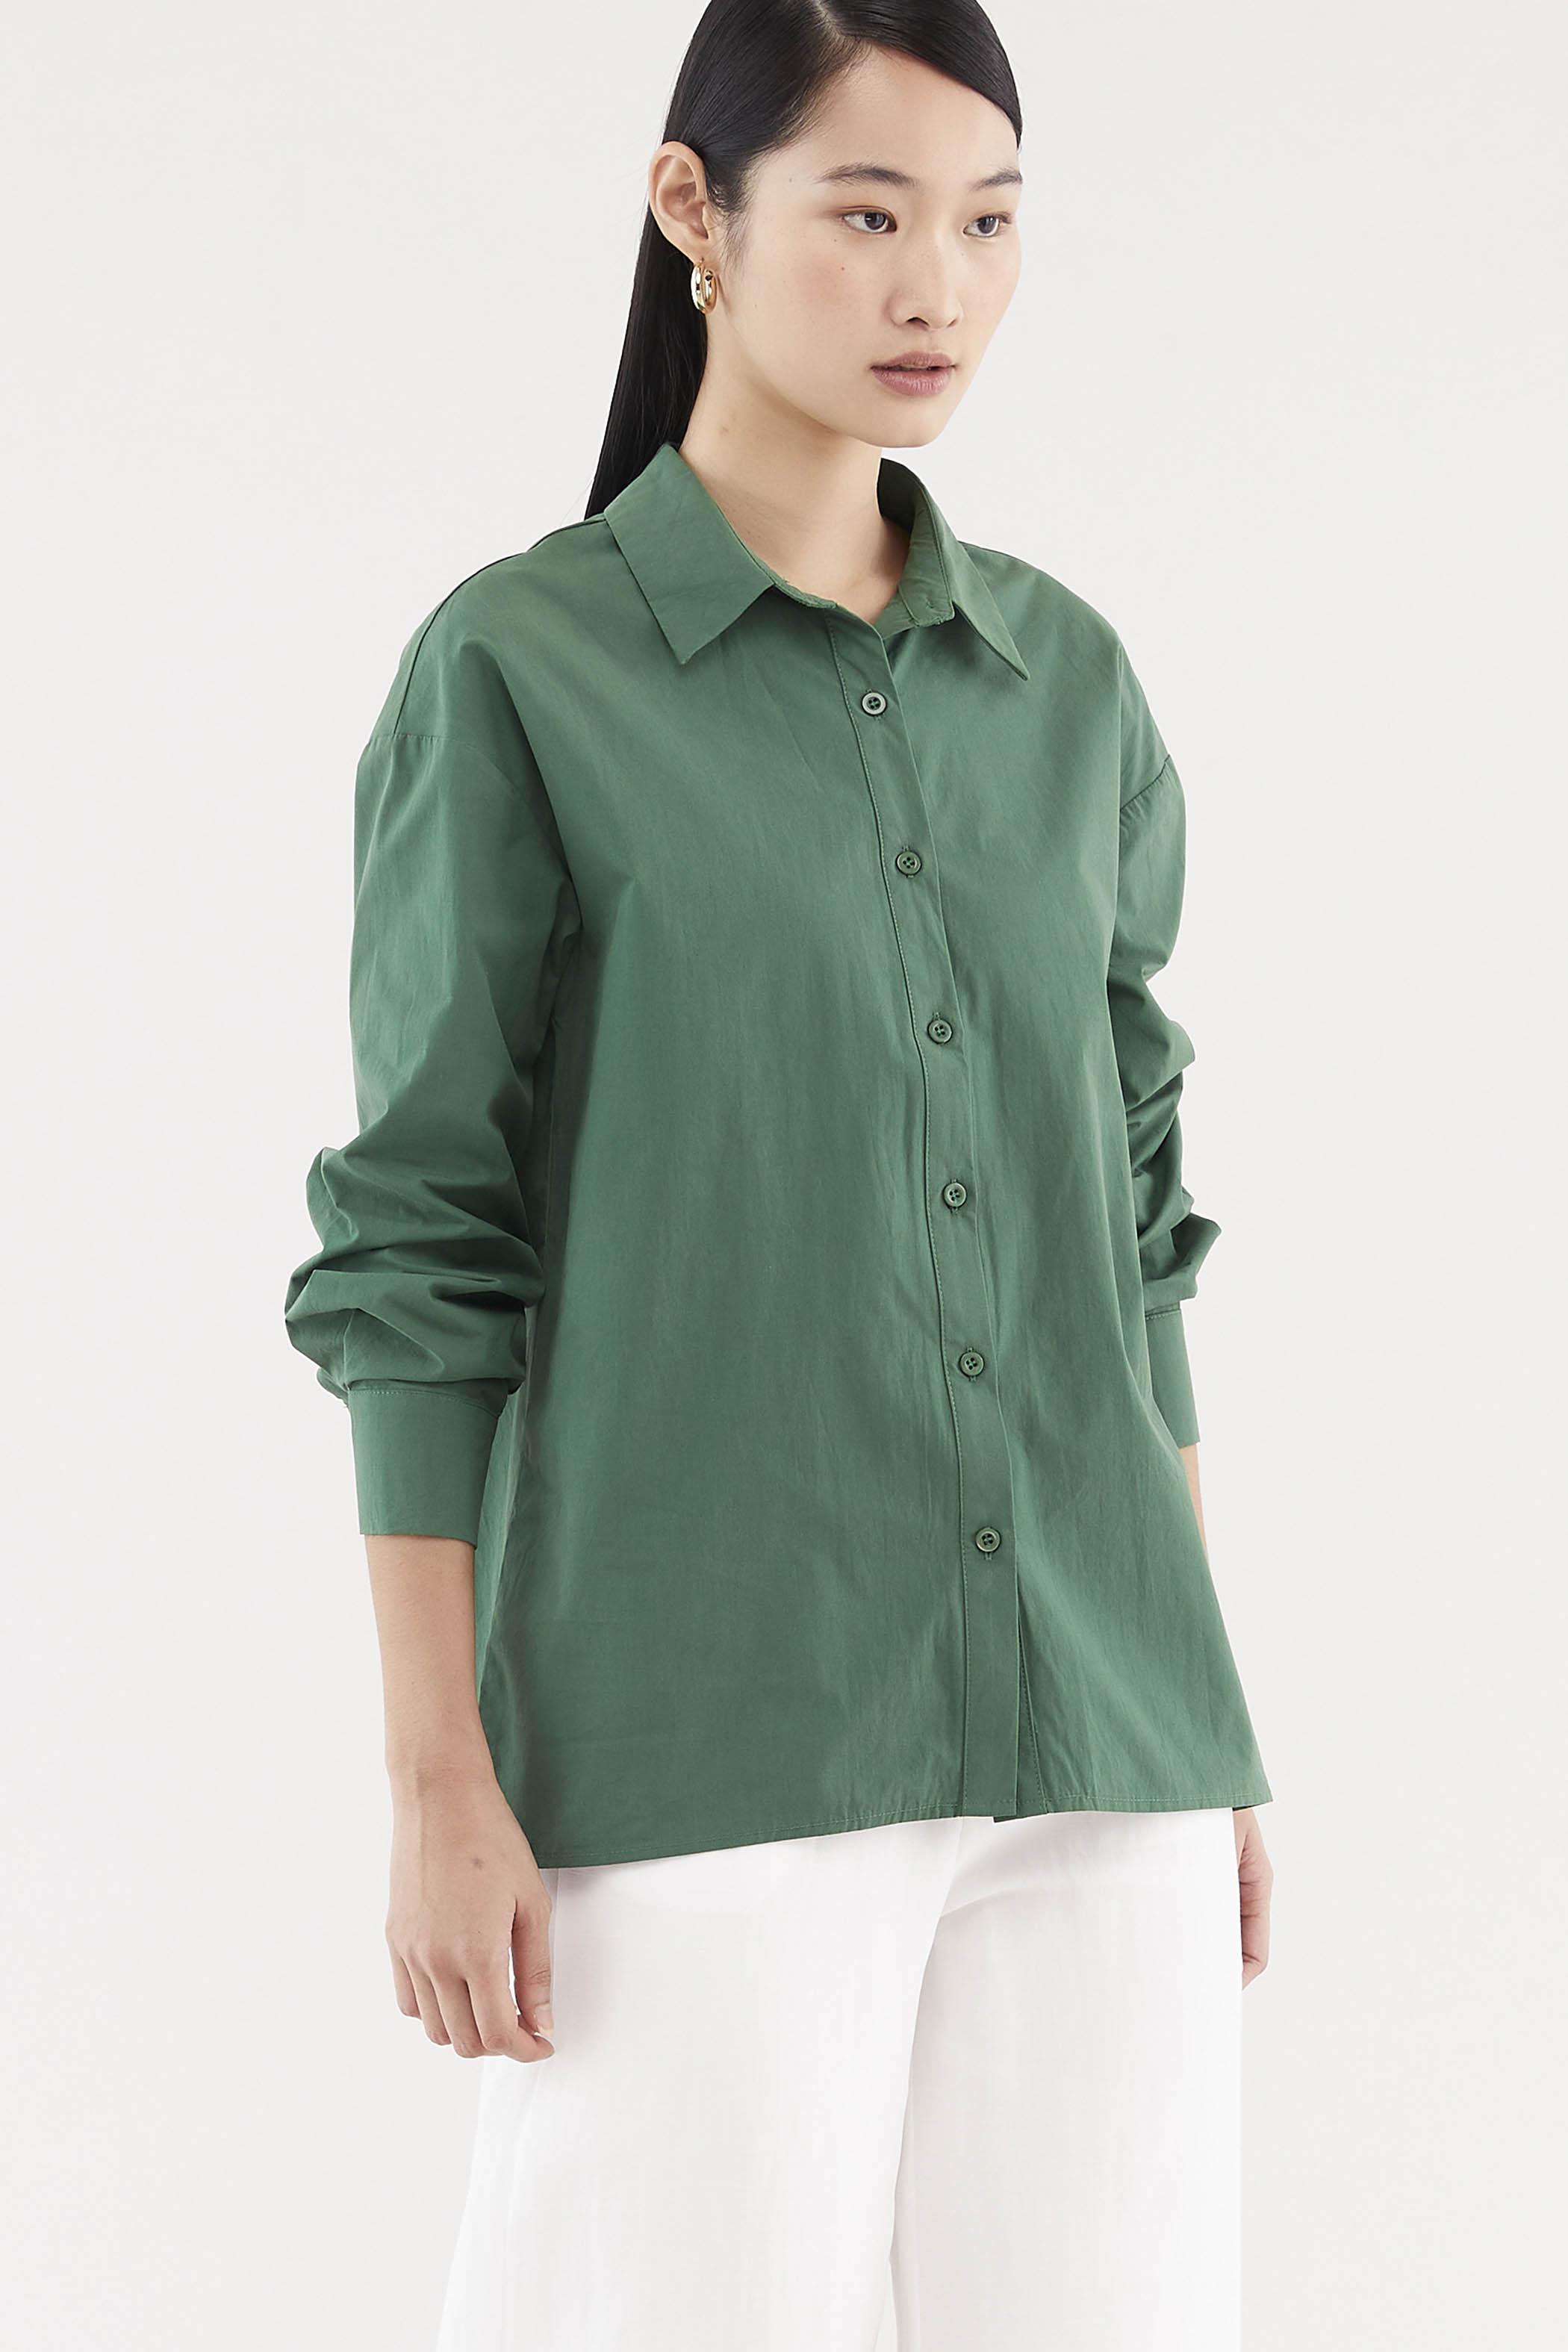 Bethy Oversized Shirt